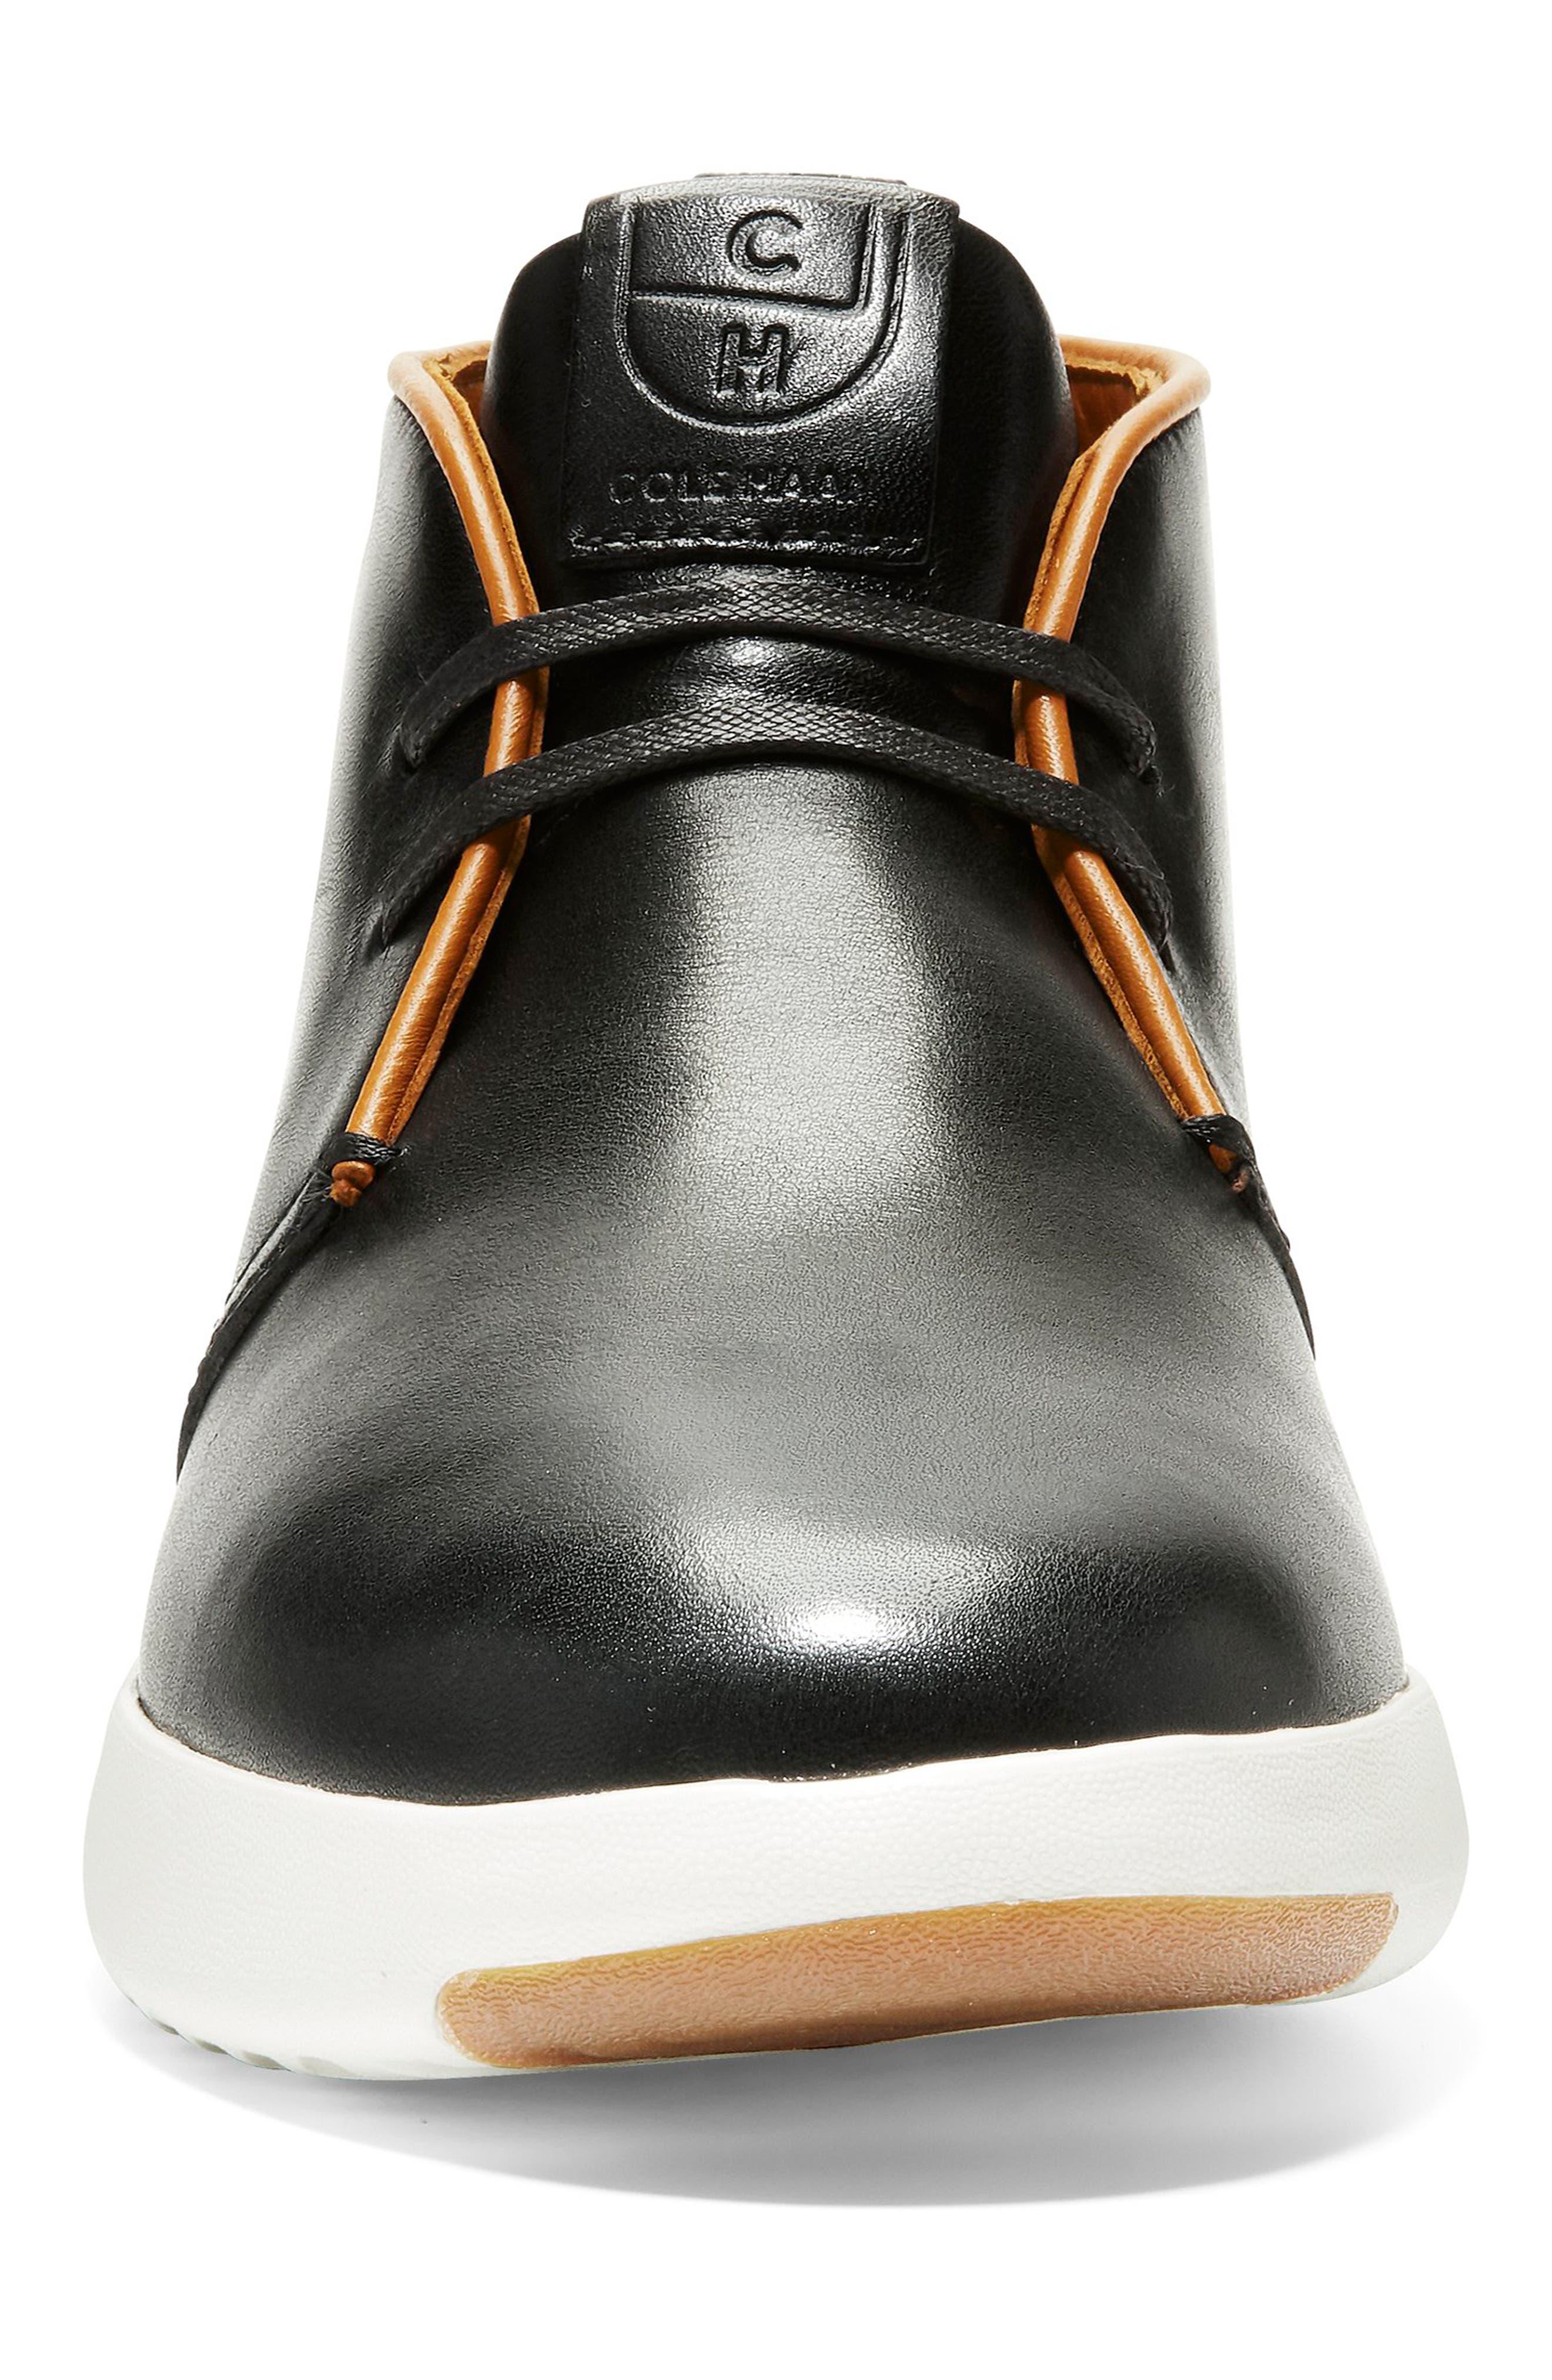 GrandPro Chukka Boot,                             Alternate thumbnail 4, color,                             BLACK/ WHITE LEATHER